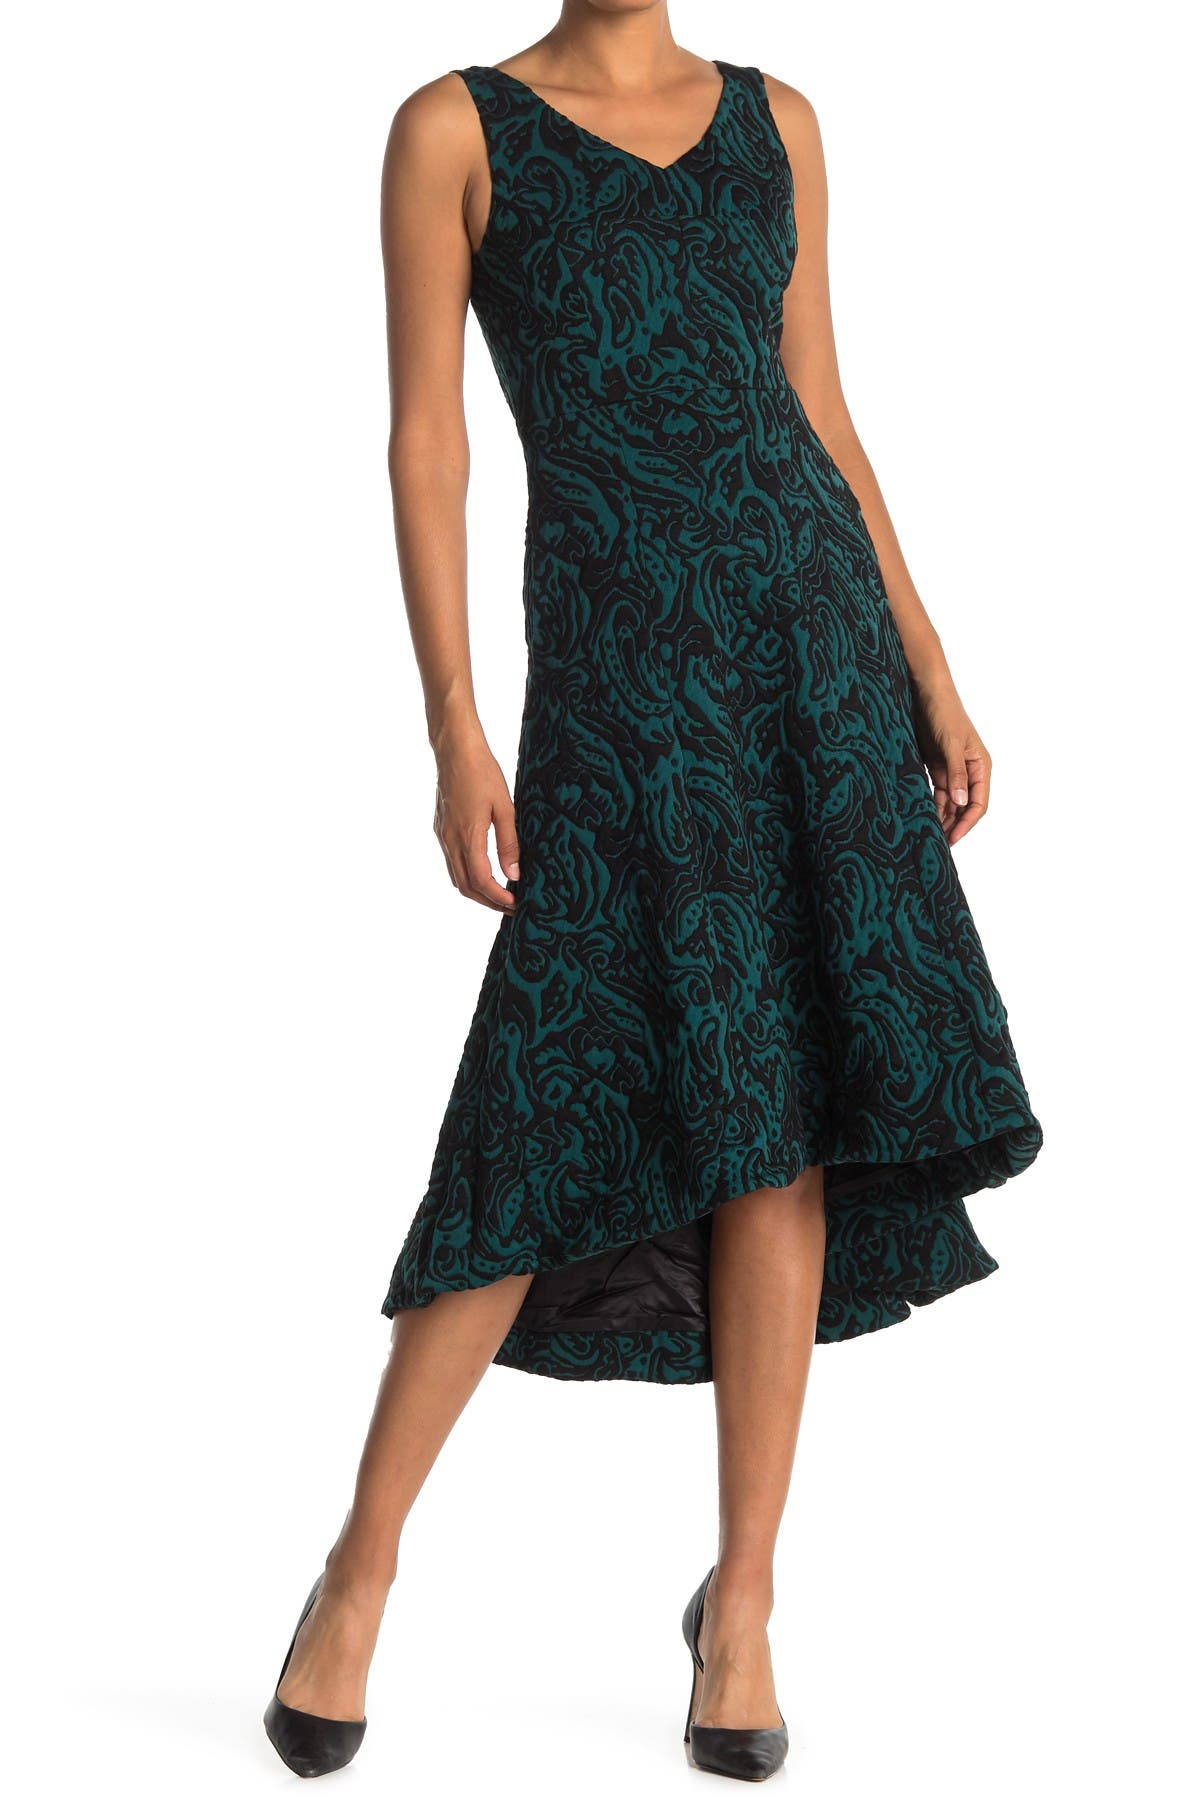 Image of Catherine Catherine Malandrino Paisley V-Neck Fit & Flare High/Low Midi Dress